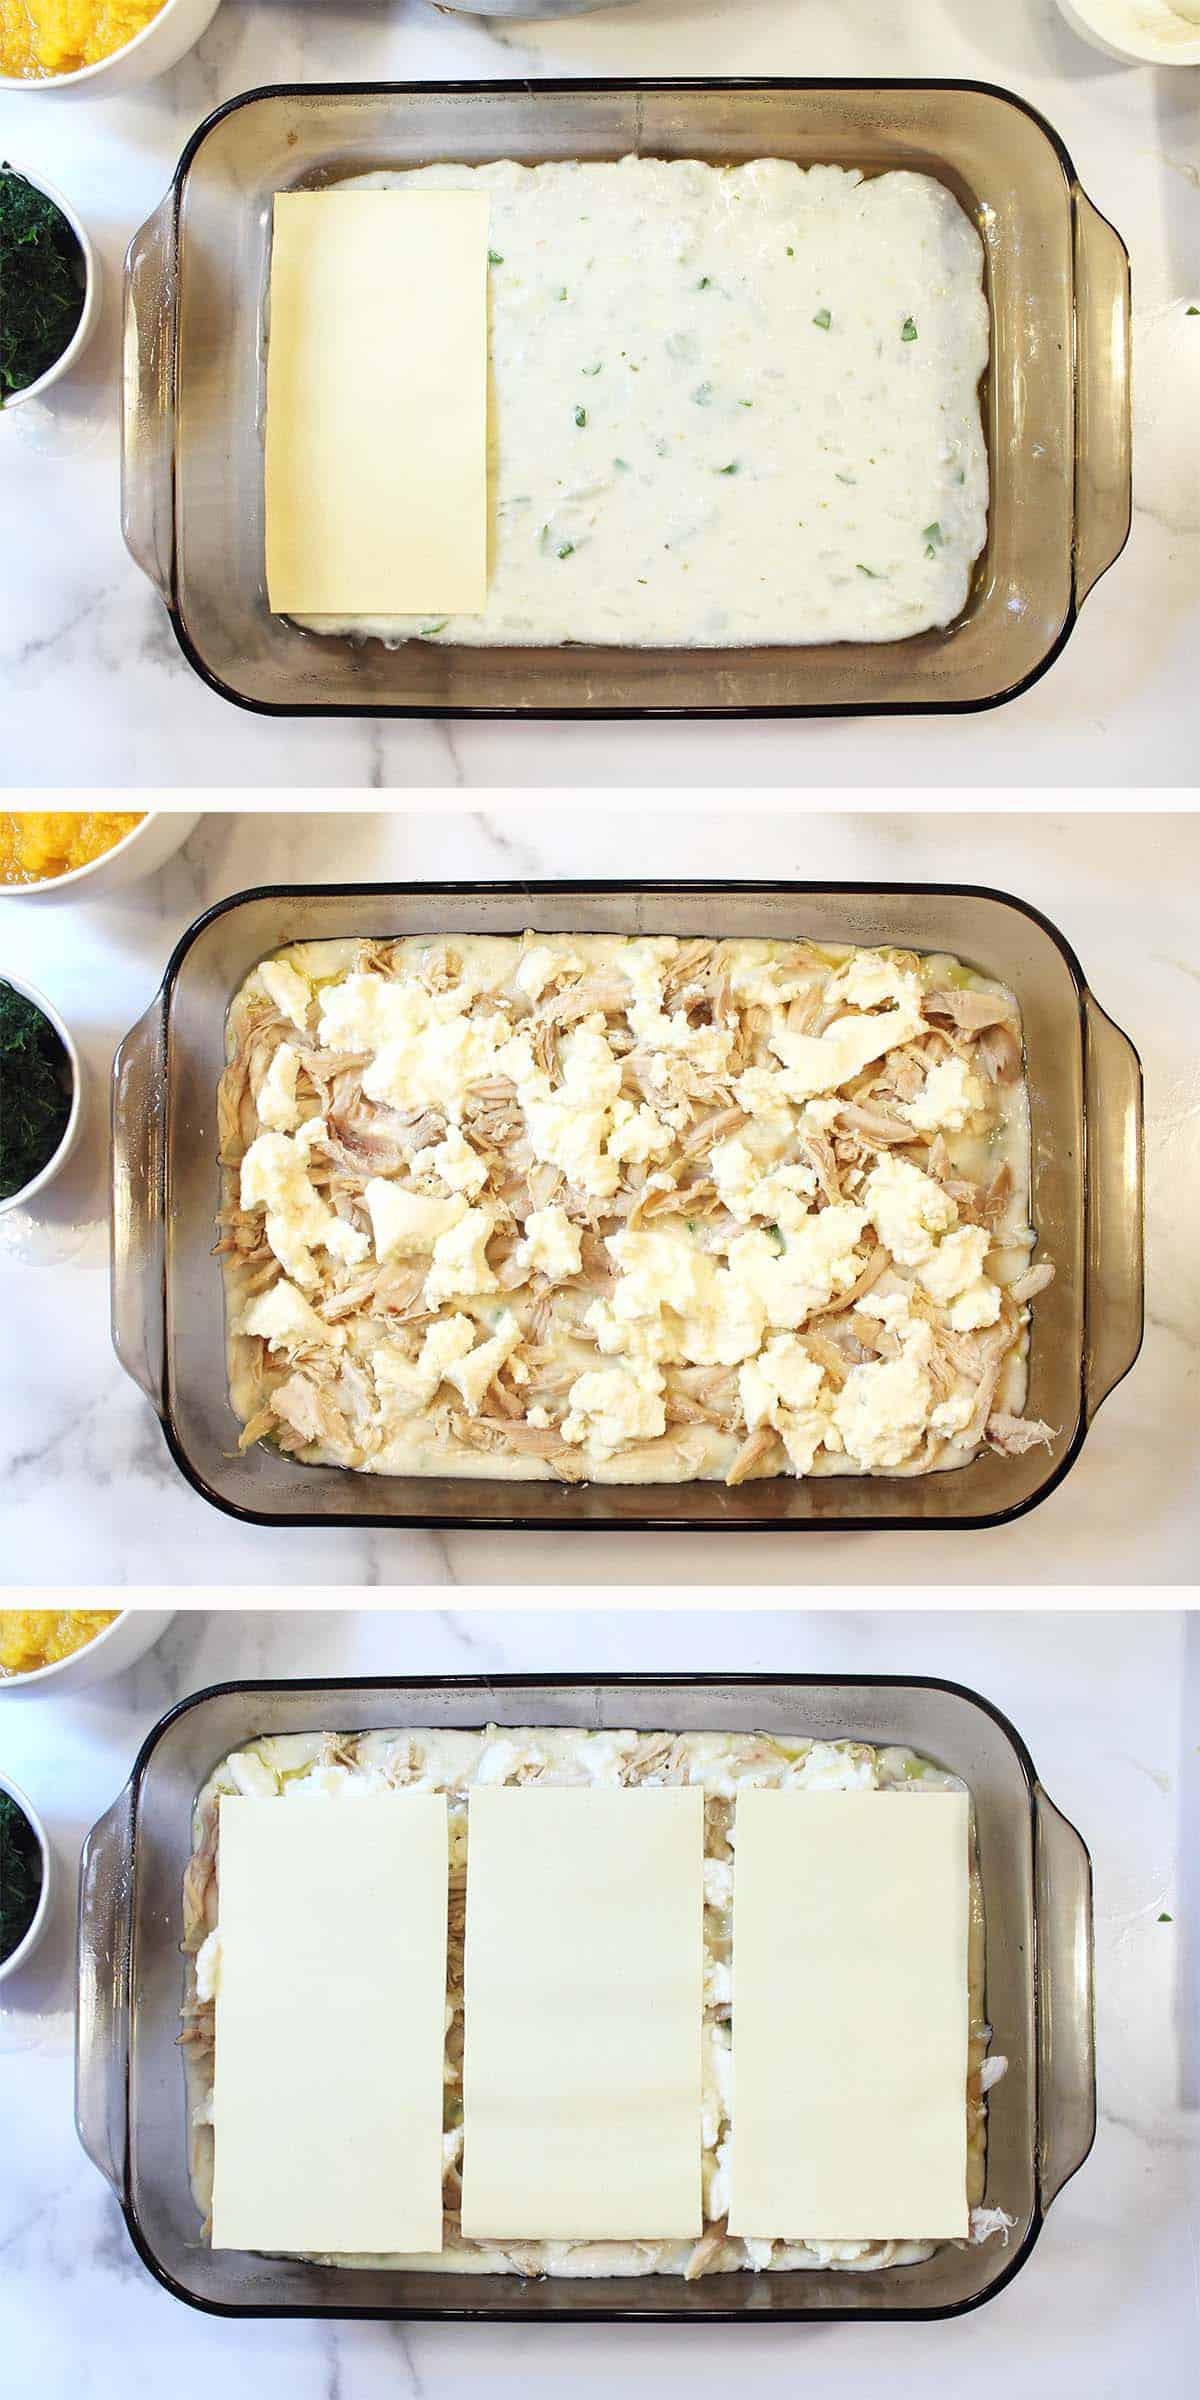 Assembling lasagna steps 1 - 3.